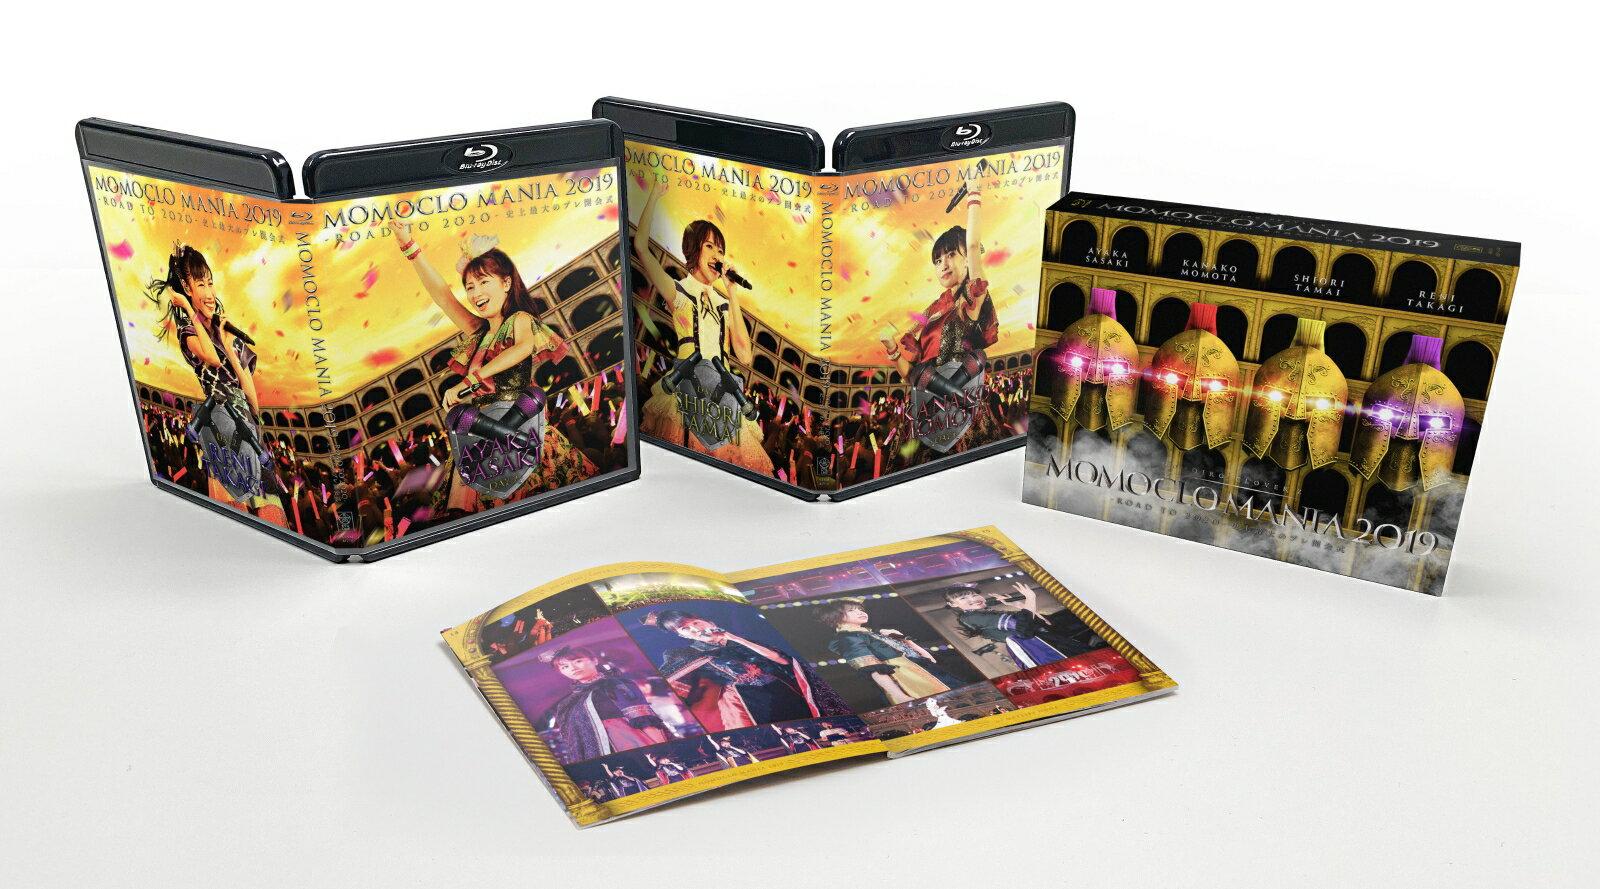 MOMOCLO MANIA 2019 ROAD TO 2020 史上最大のプレ開会式 LIVE Blu-ray【Blu-ray】